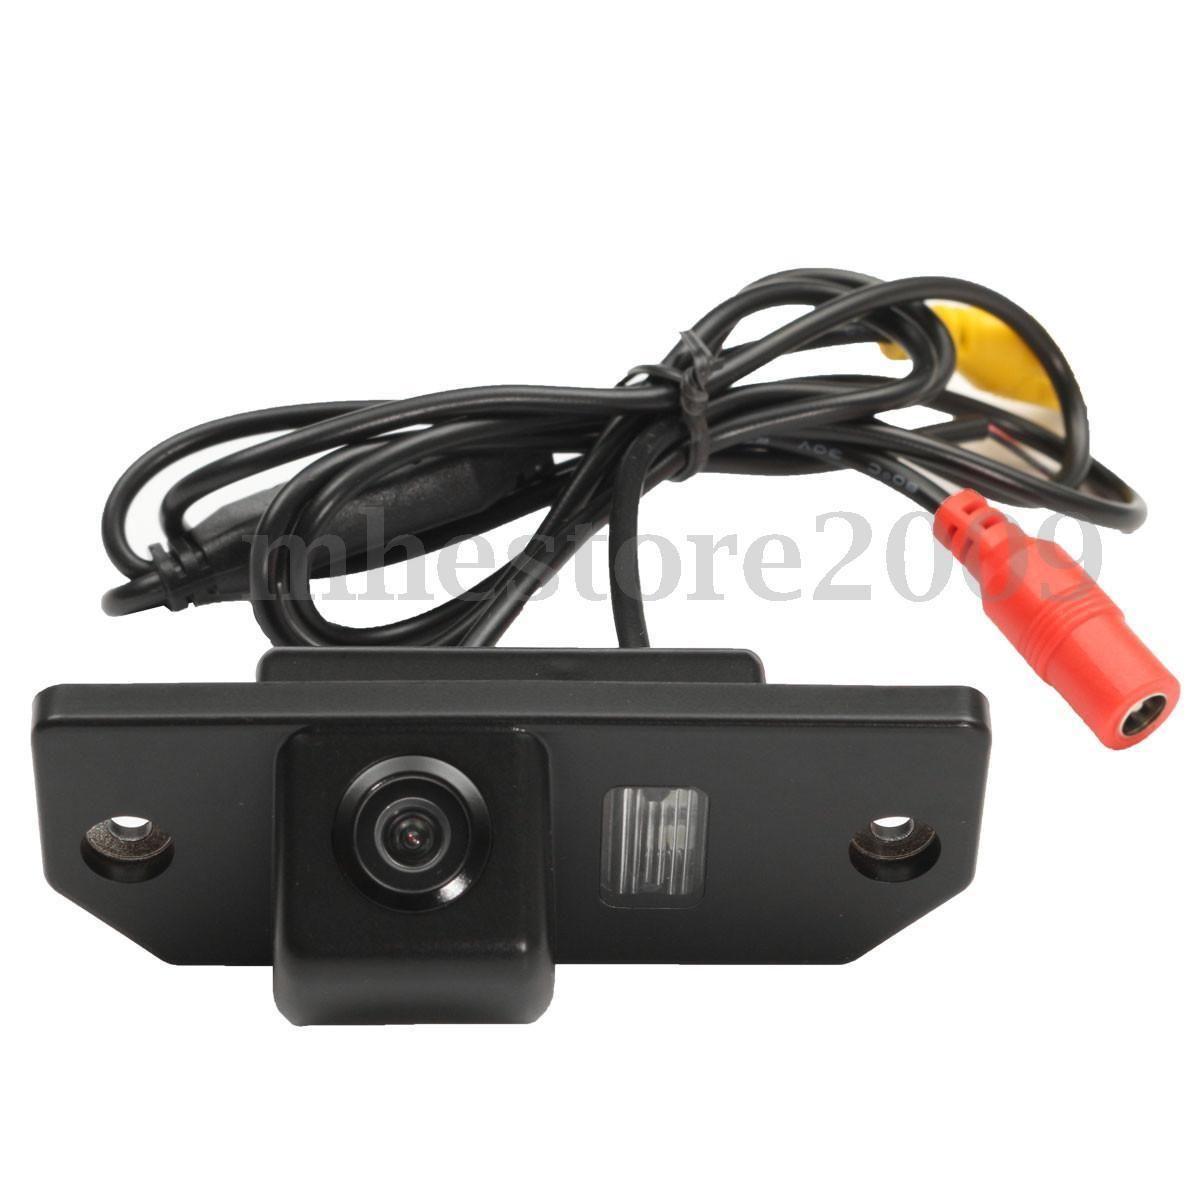 9 44 12v Hd Waterproof Car Rear View Reversing Backup Camera